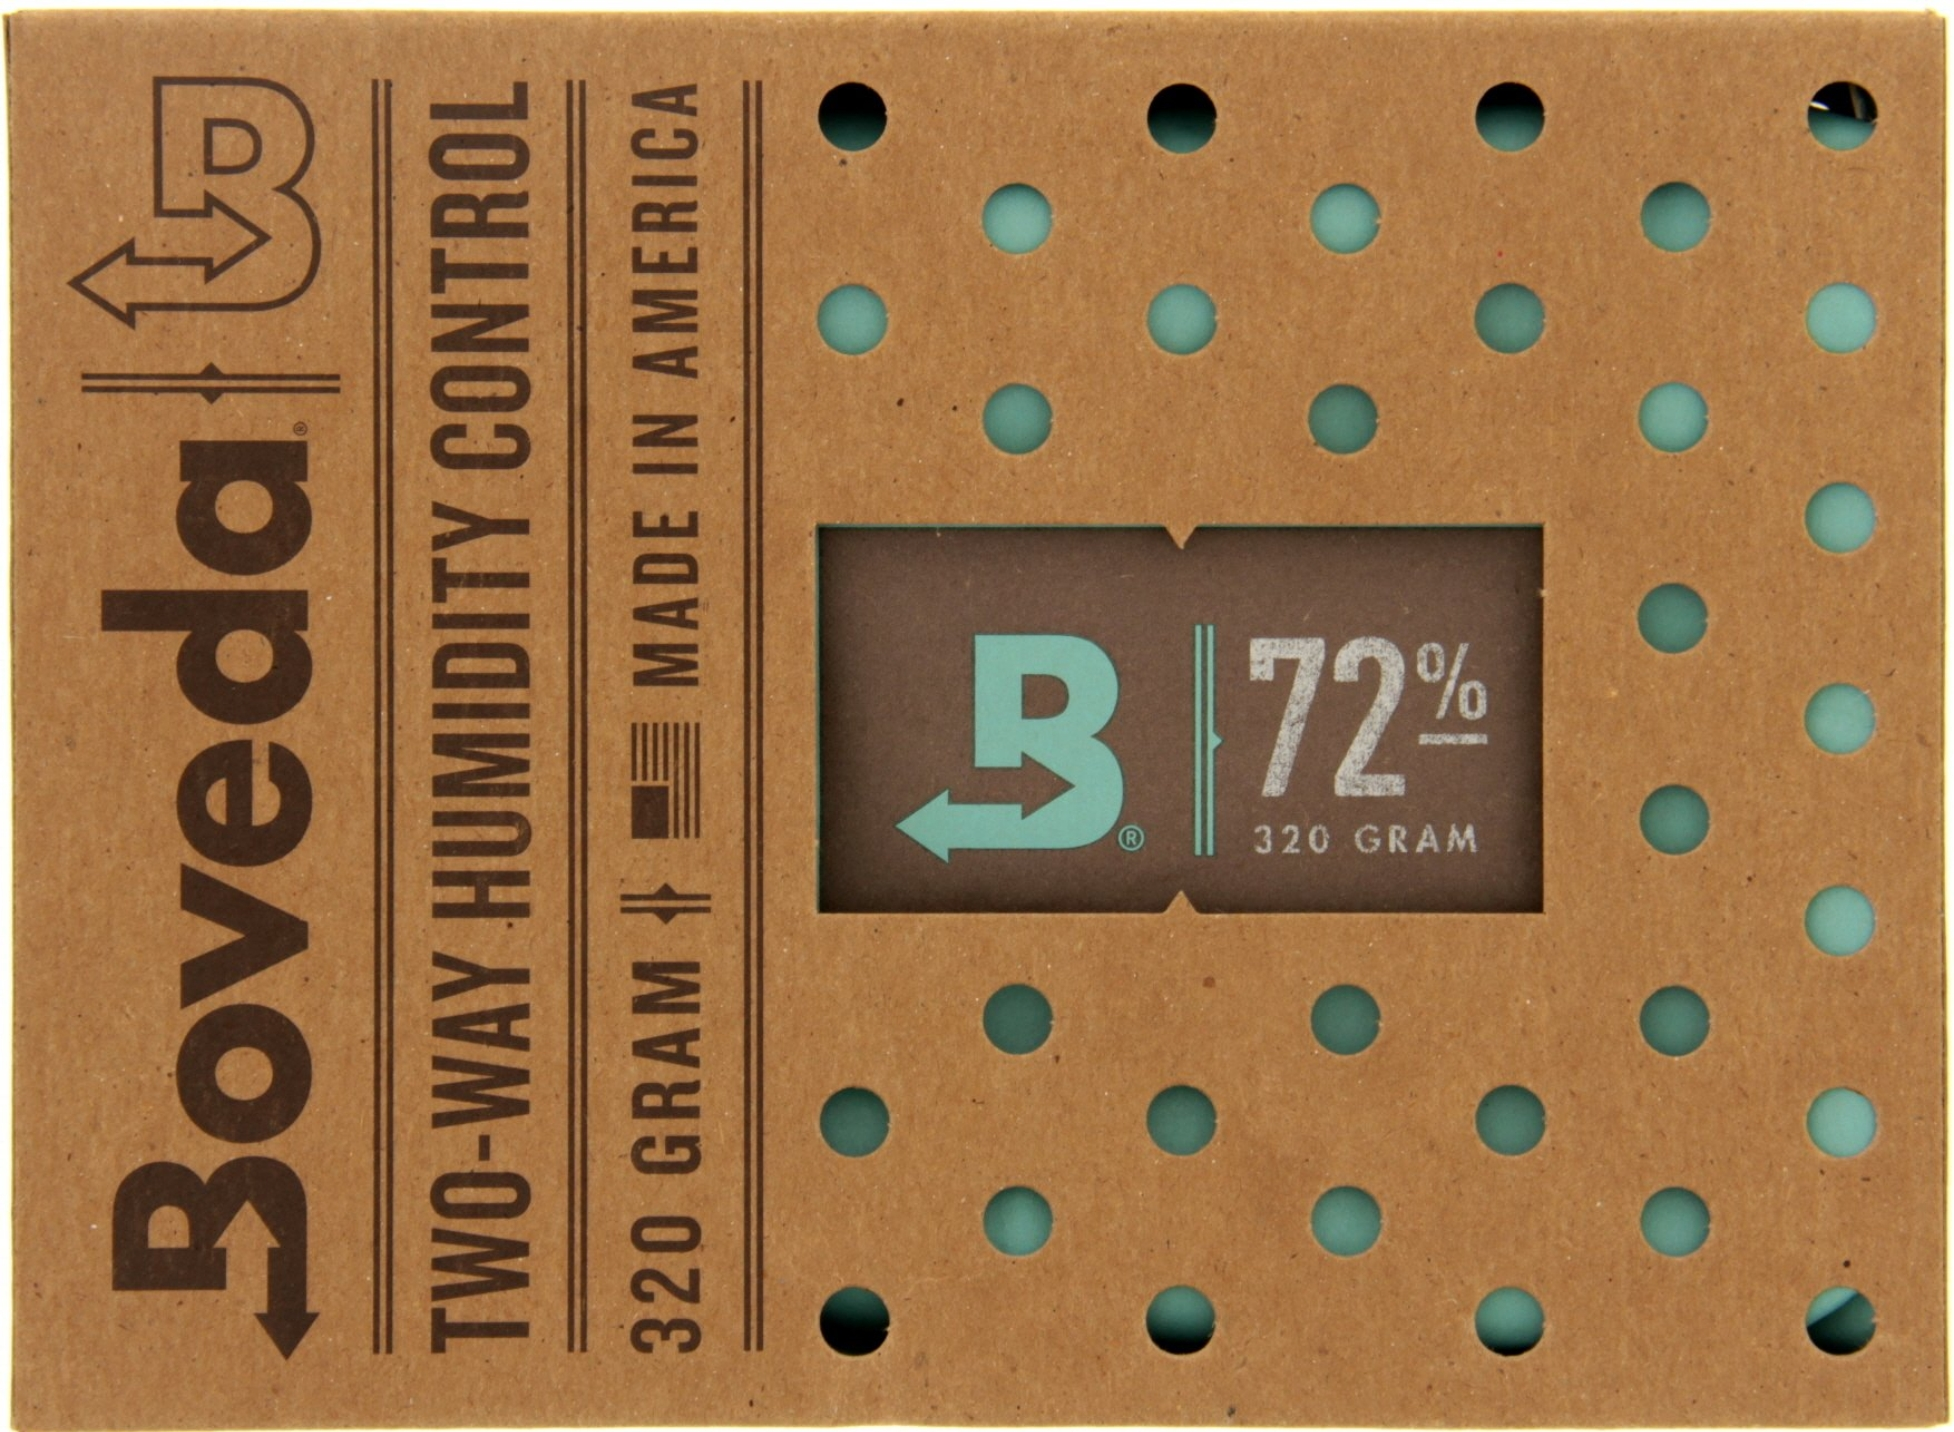 12 x Boveda Humidipak 2-way Humidifer groß 75/% Boveda Befeuchter für Humidore